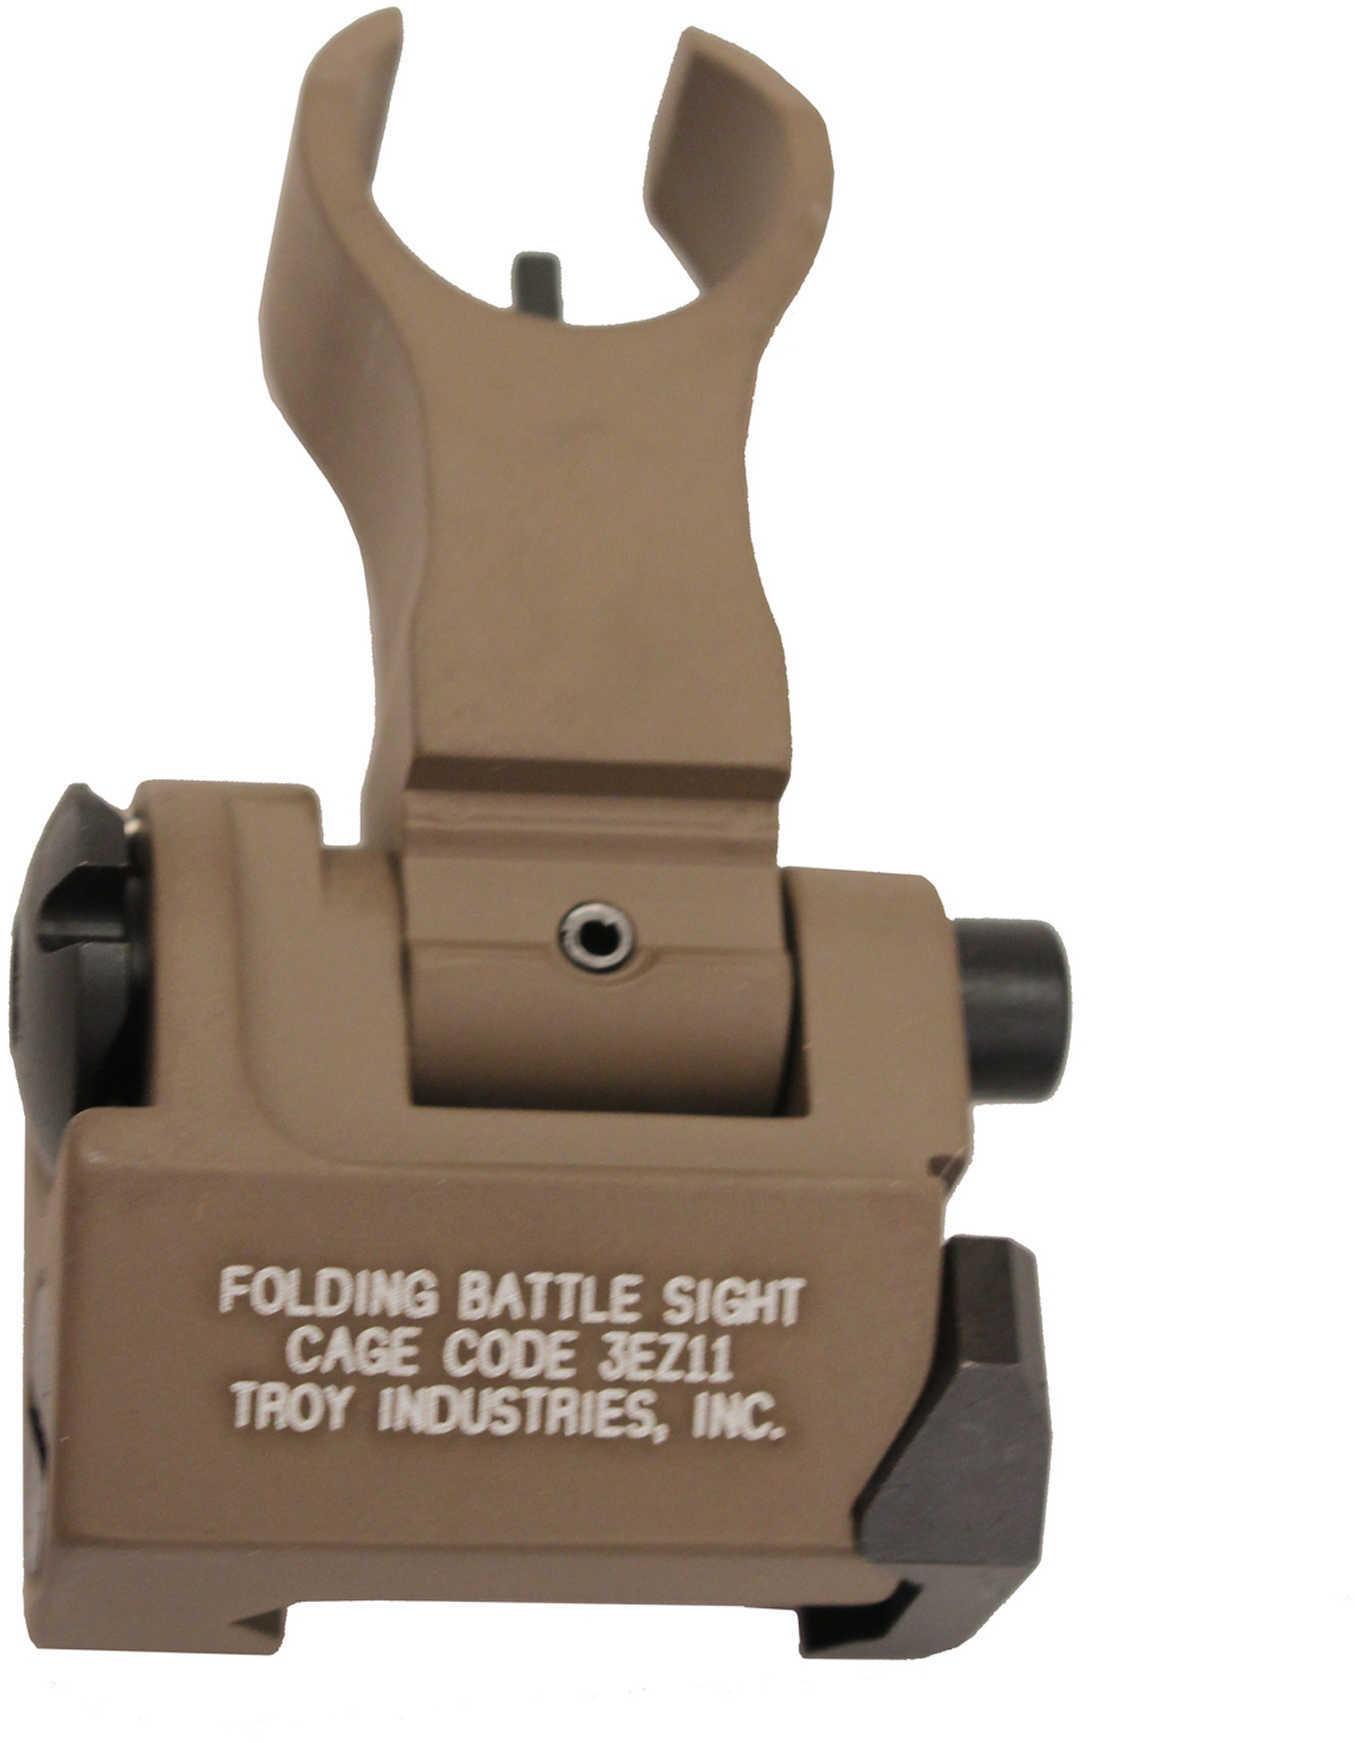 Troy BattleSight Folding Front Sight HK style Picatinny Flat Dark Earth Finish SSIG-FBS-FHFT-00